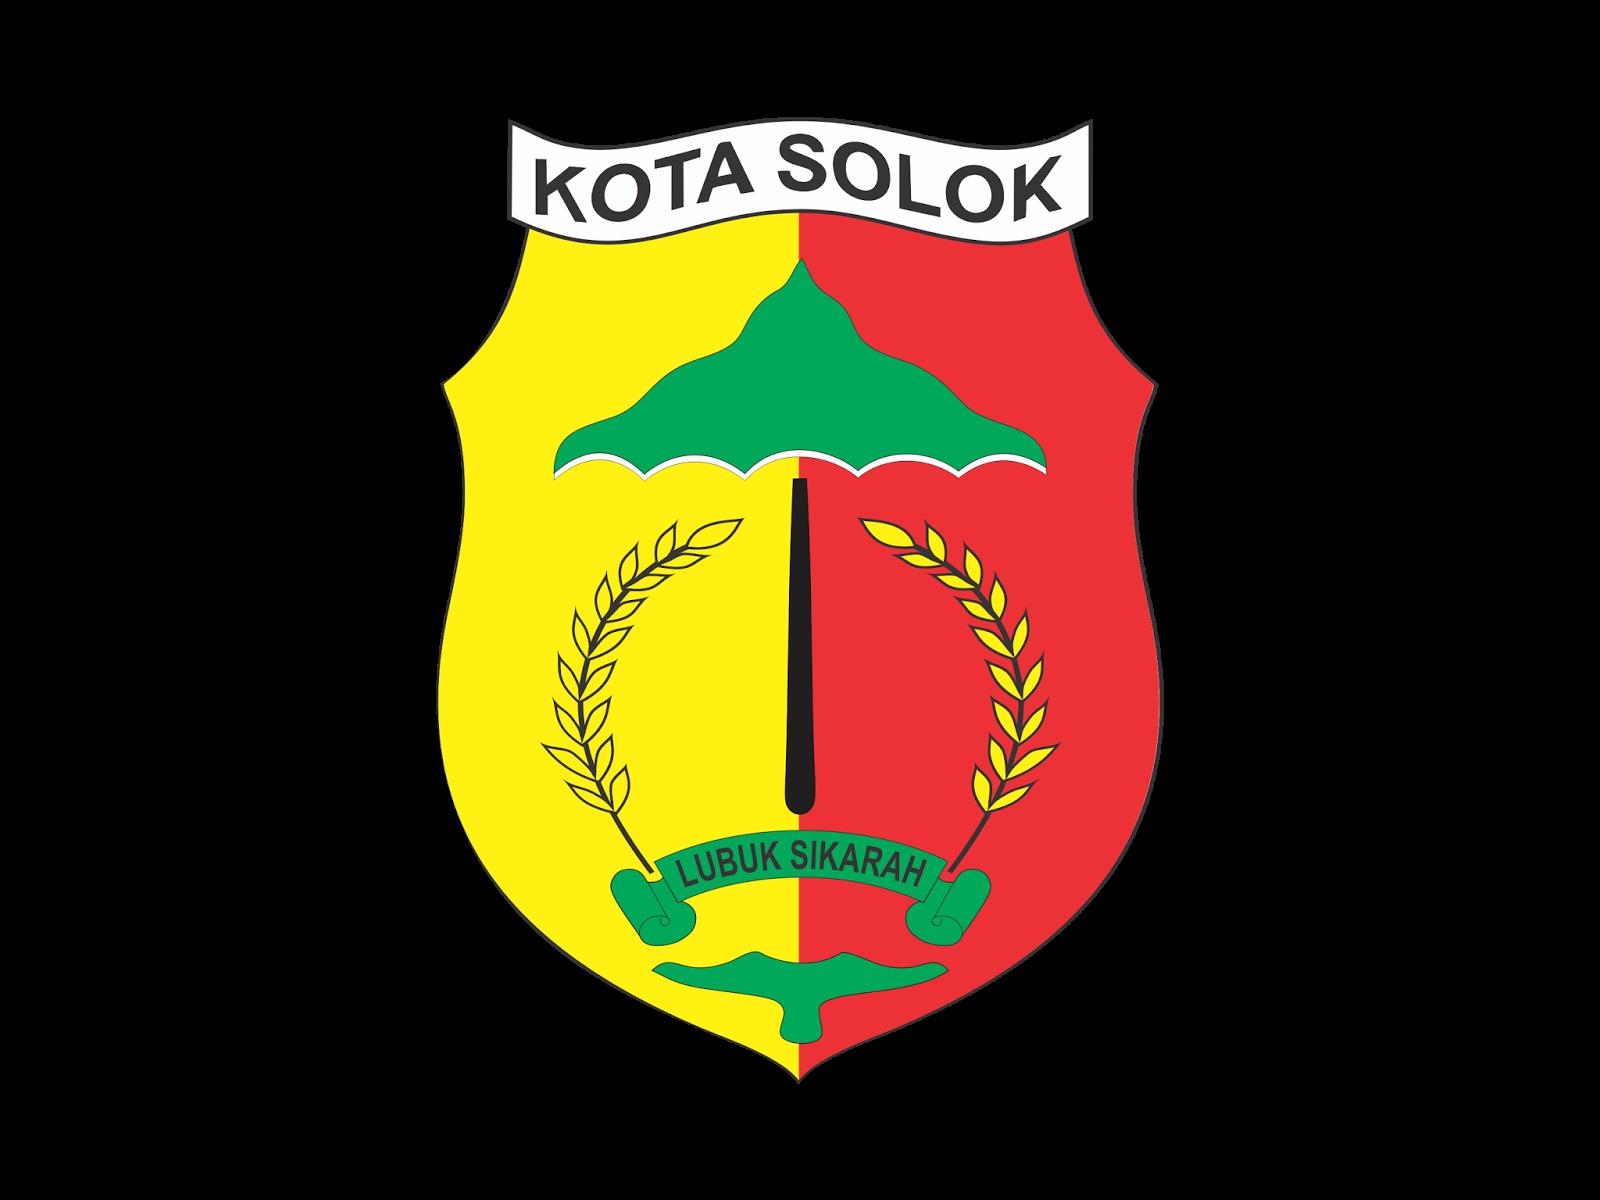 Logo Kota Solok Vector Cdr Png Hd Biologizone